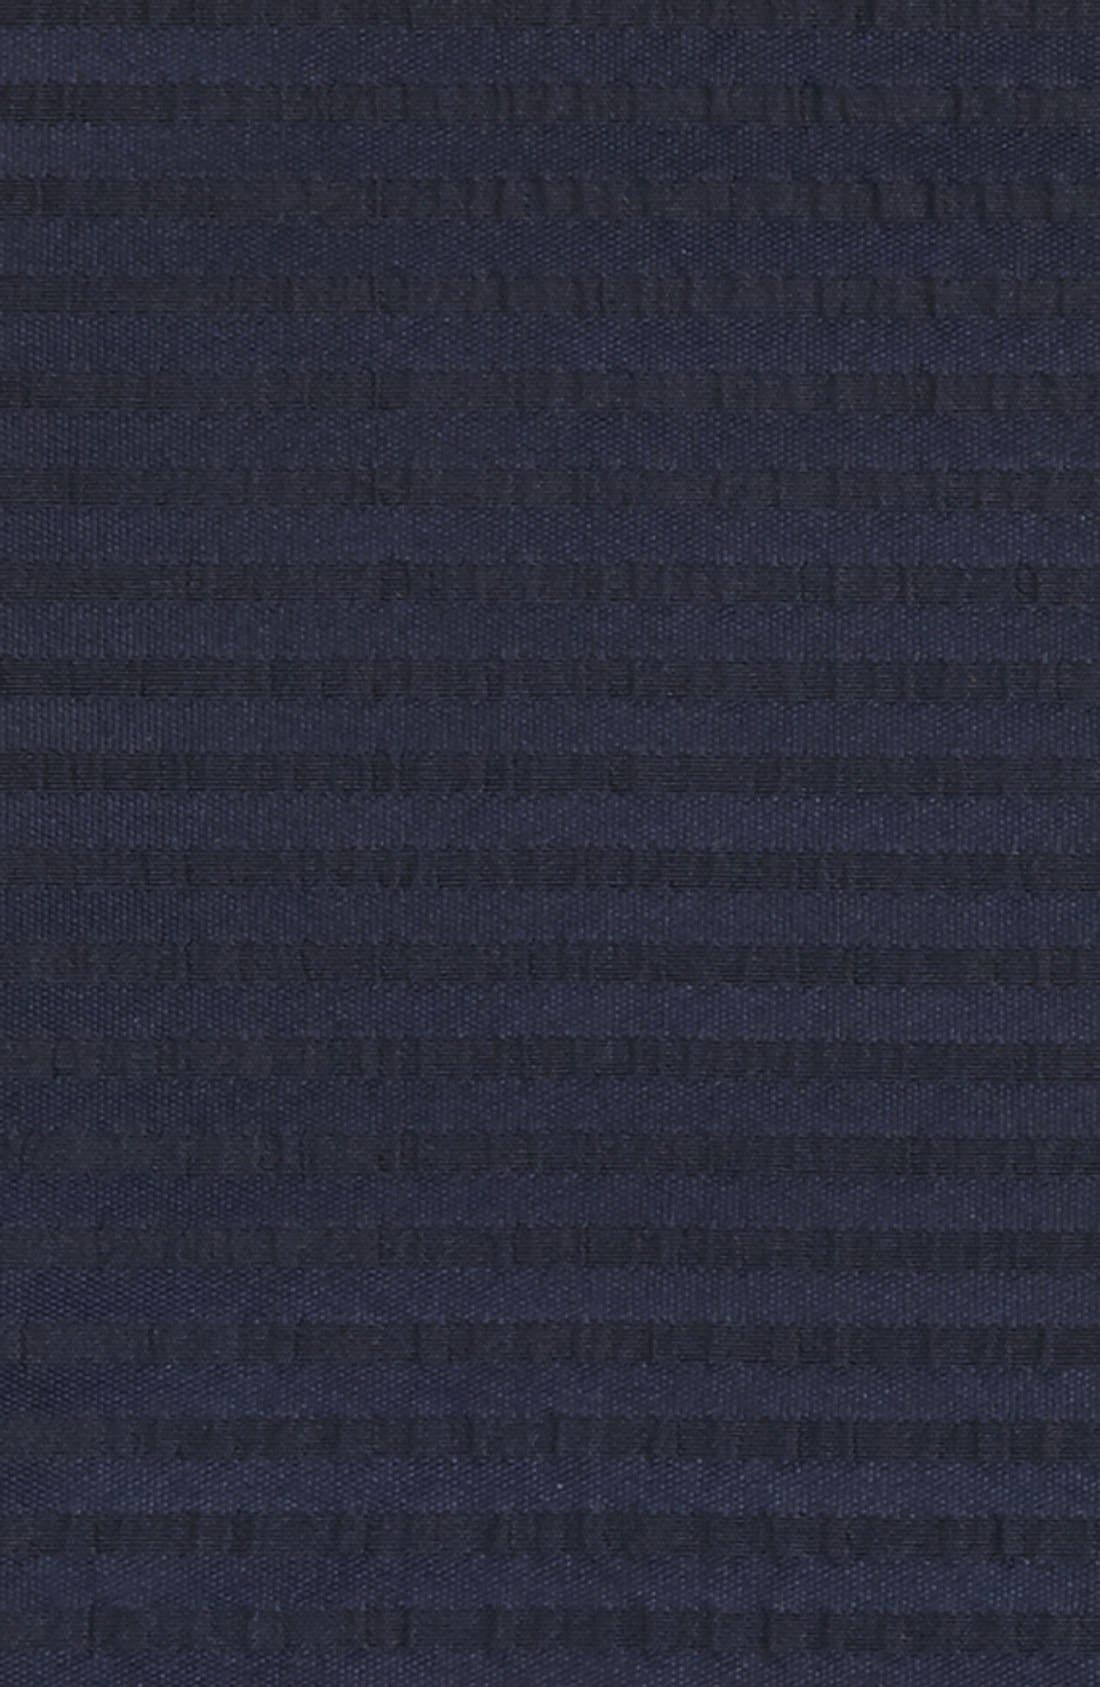 Alternate Image 3  - BOSS Black Silk Pocket Square